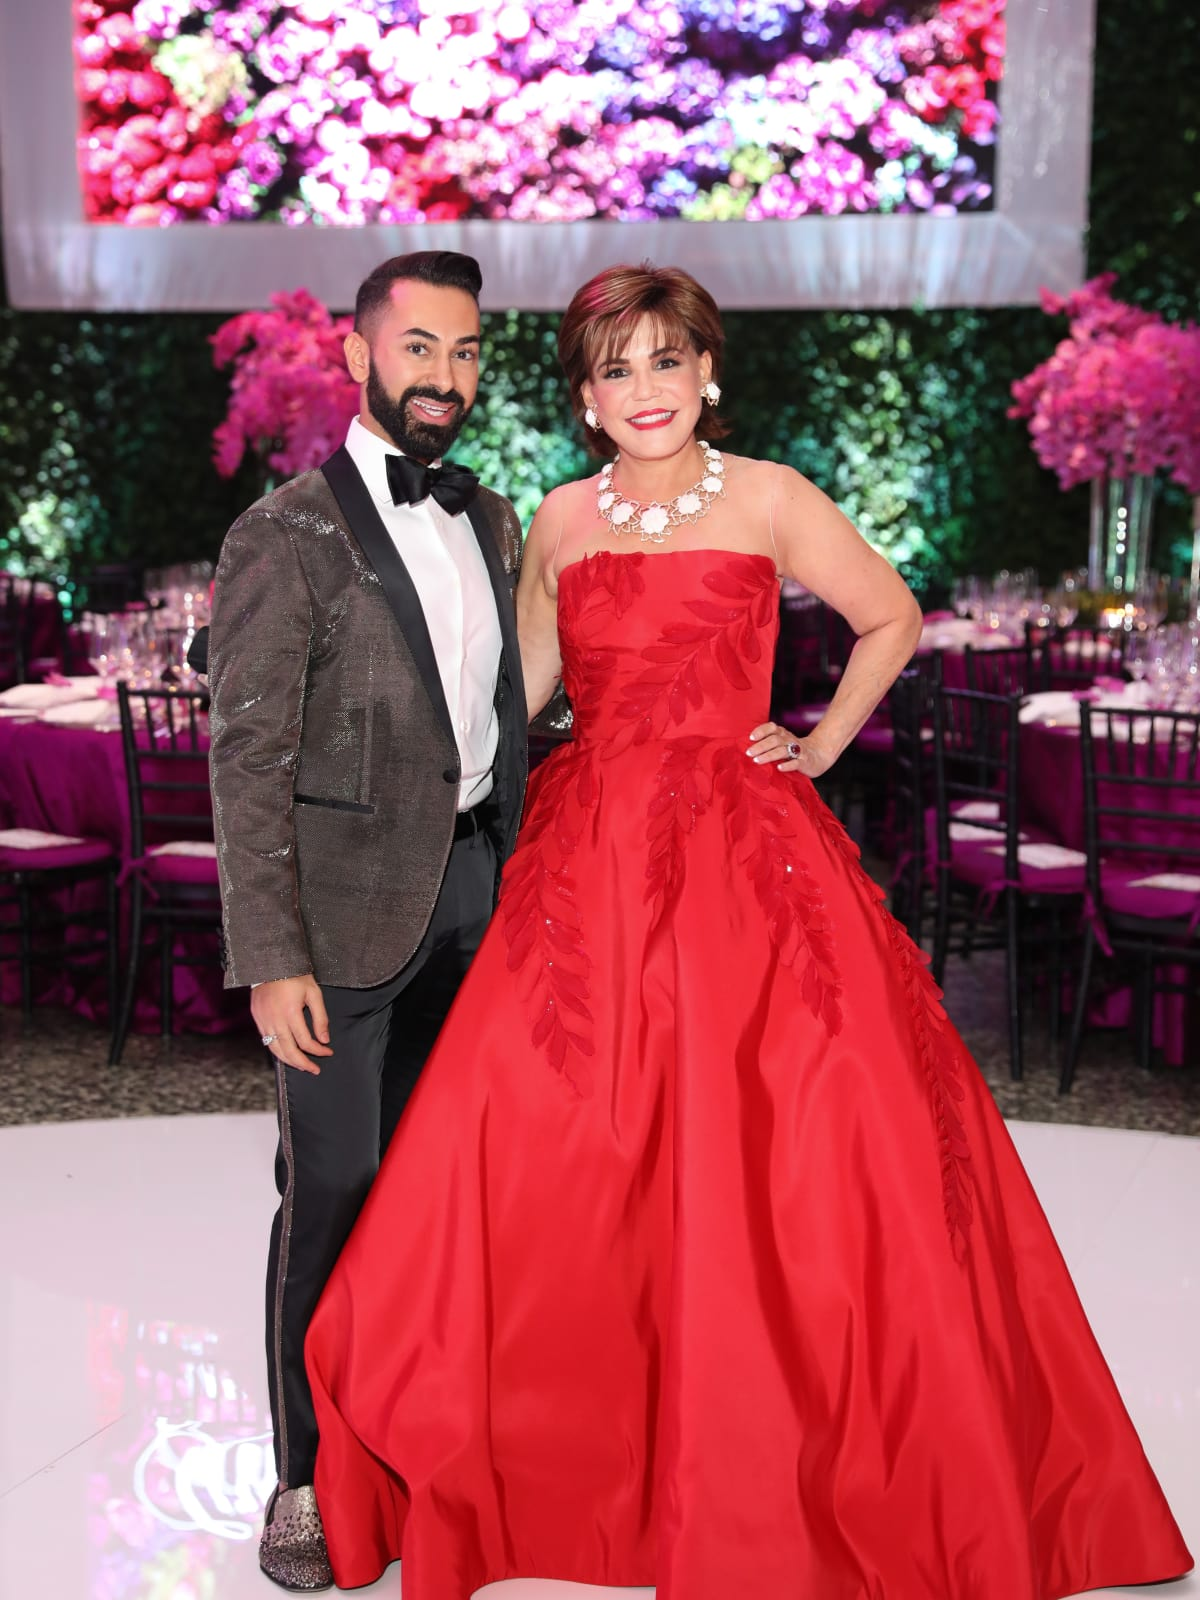 Fady Armanious and Hallie Vanderhider at MFAH Grand Gala Ball